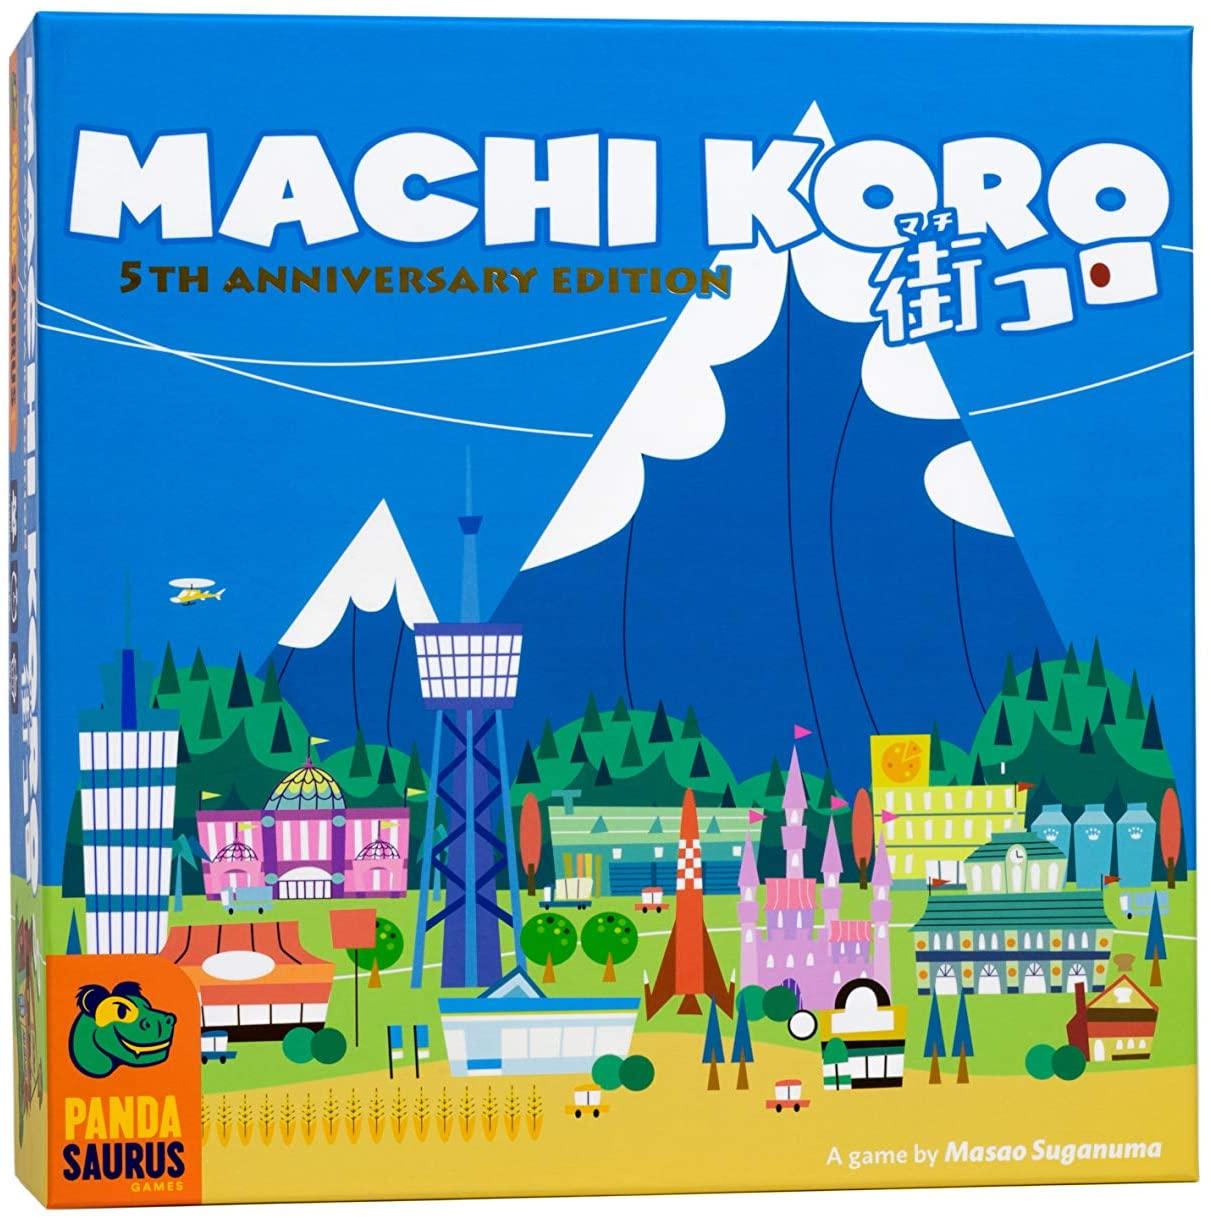 Machi Koro - 5th Anniversary Edition